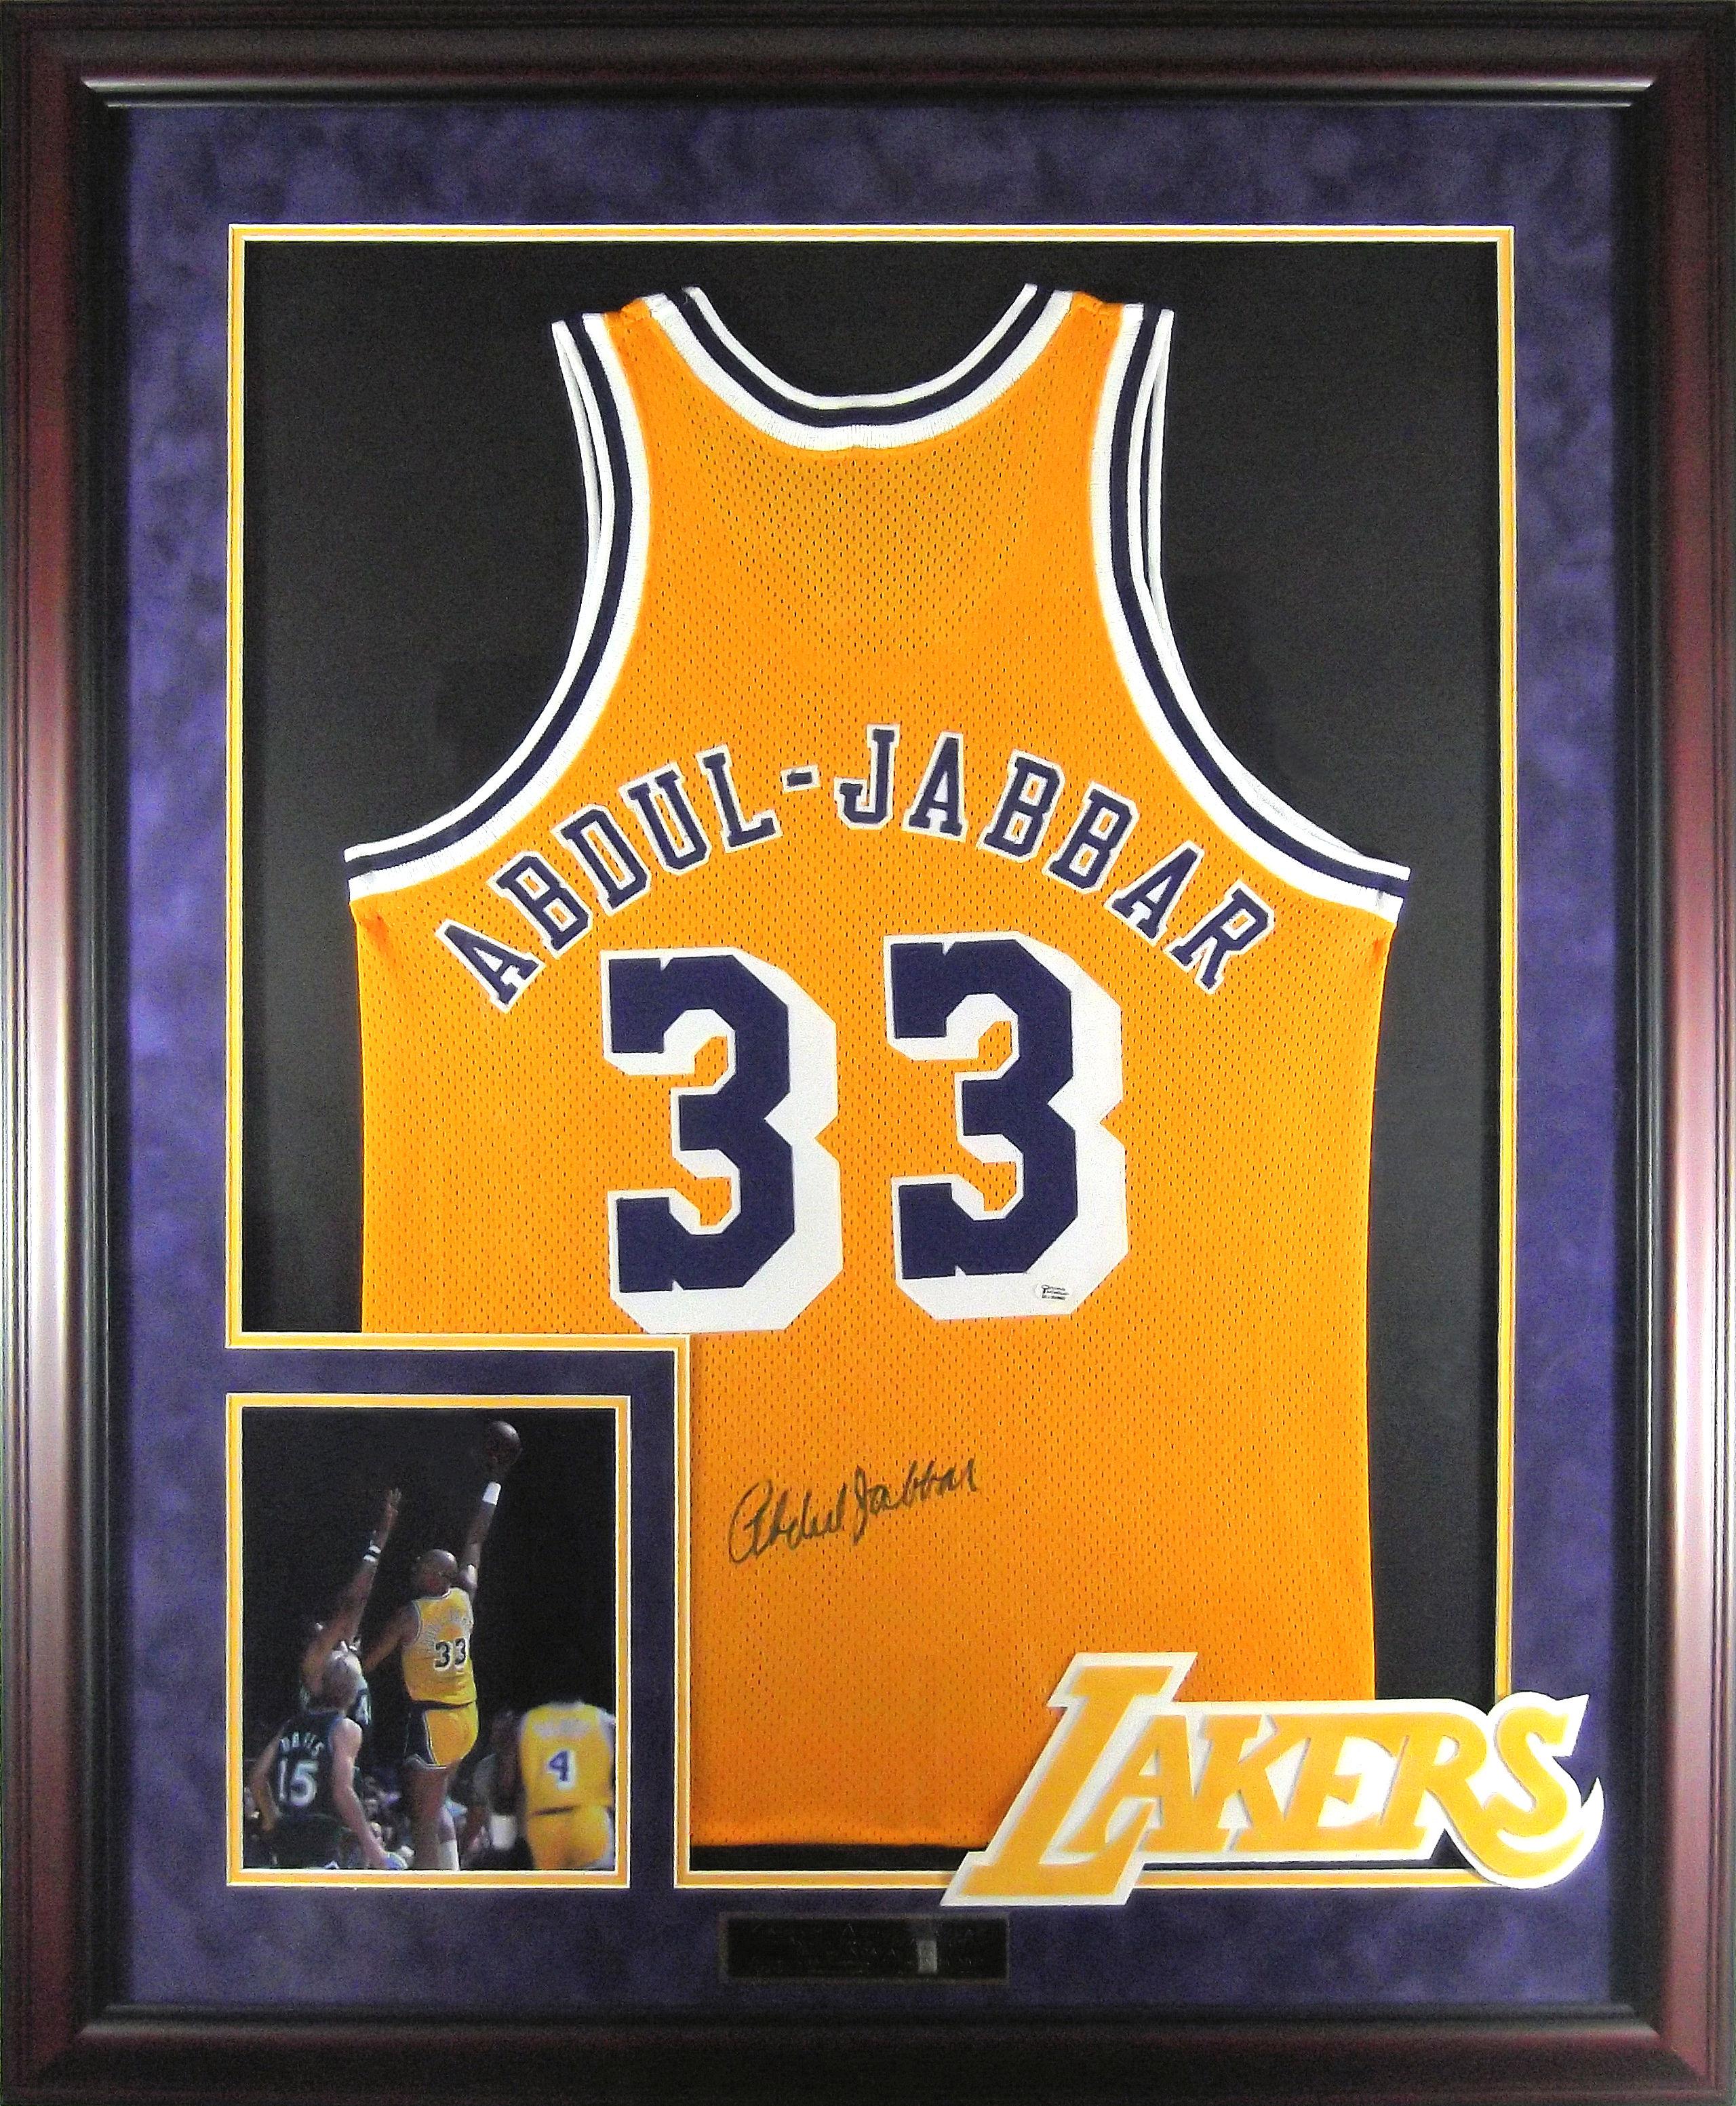 separation shoes 50d3f 96837 Kareem Abdul-Jabbar Autographed Lakers Jersey